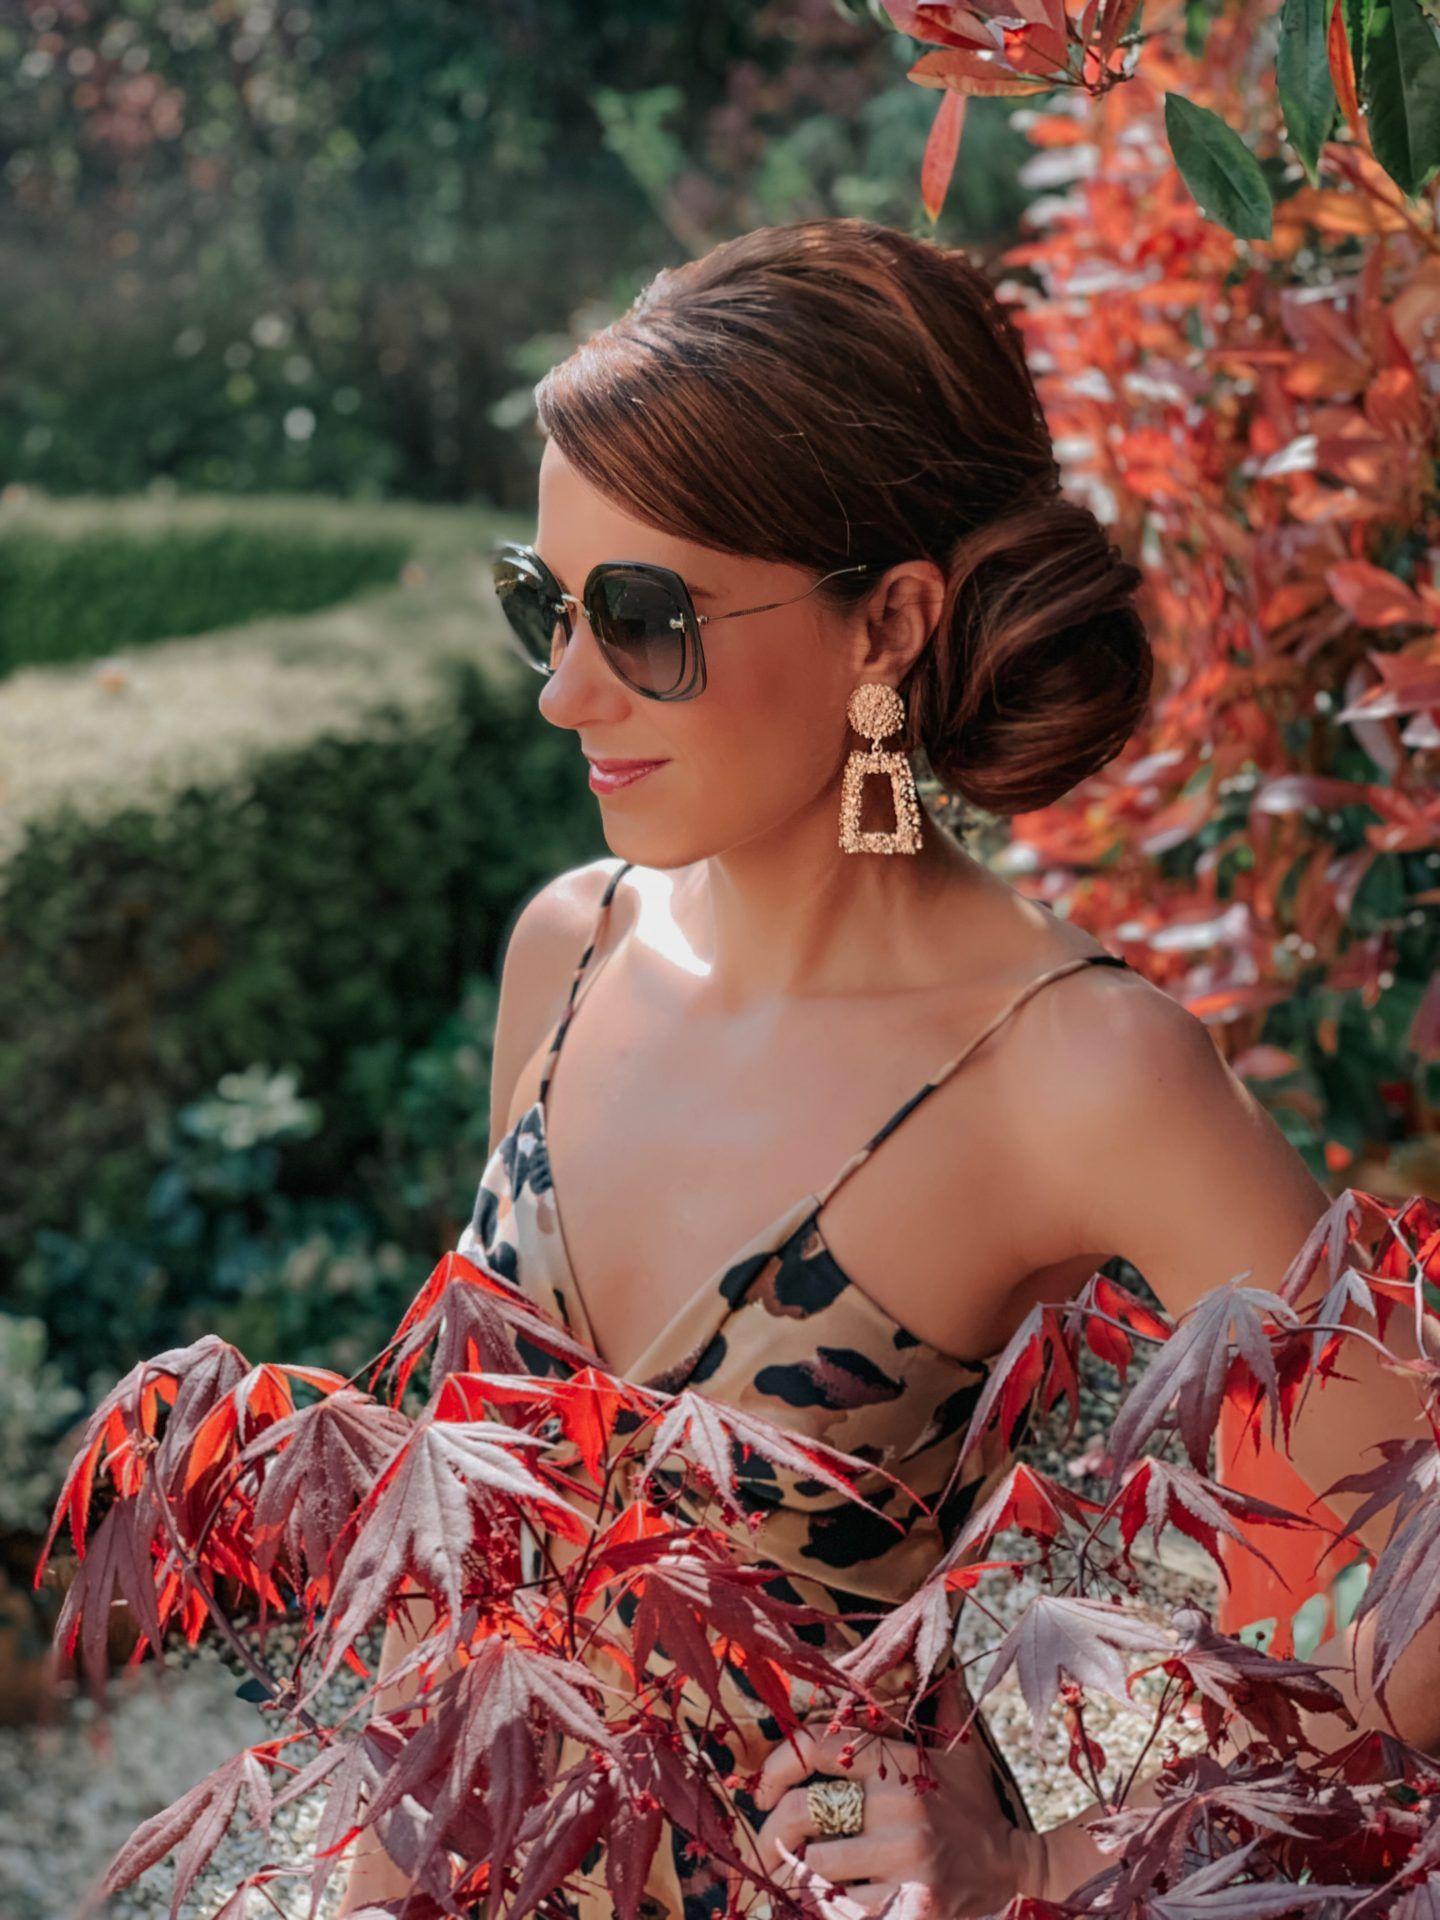 Forever Unique Leopard Print Wide-Leg Jumpsuit | Zara square earrings | Miu Miu sunglasses | Charlotte Tilbury make up | River Island Heels | Next Natural Square Shopper Bag